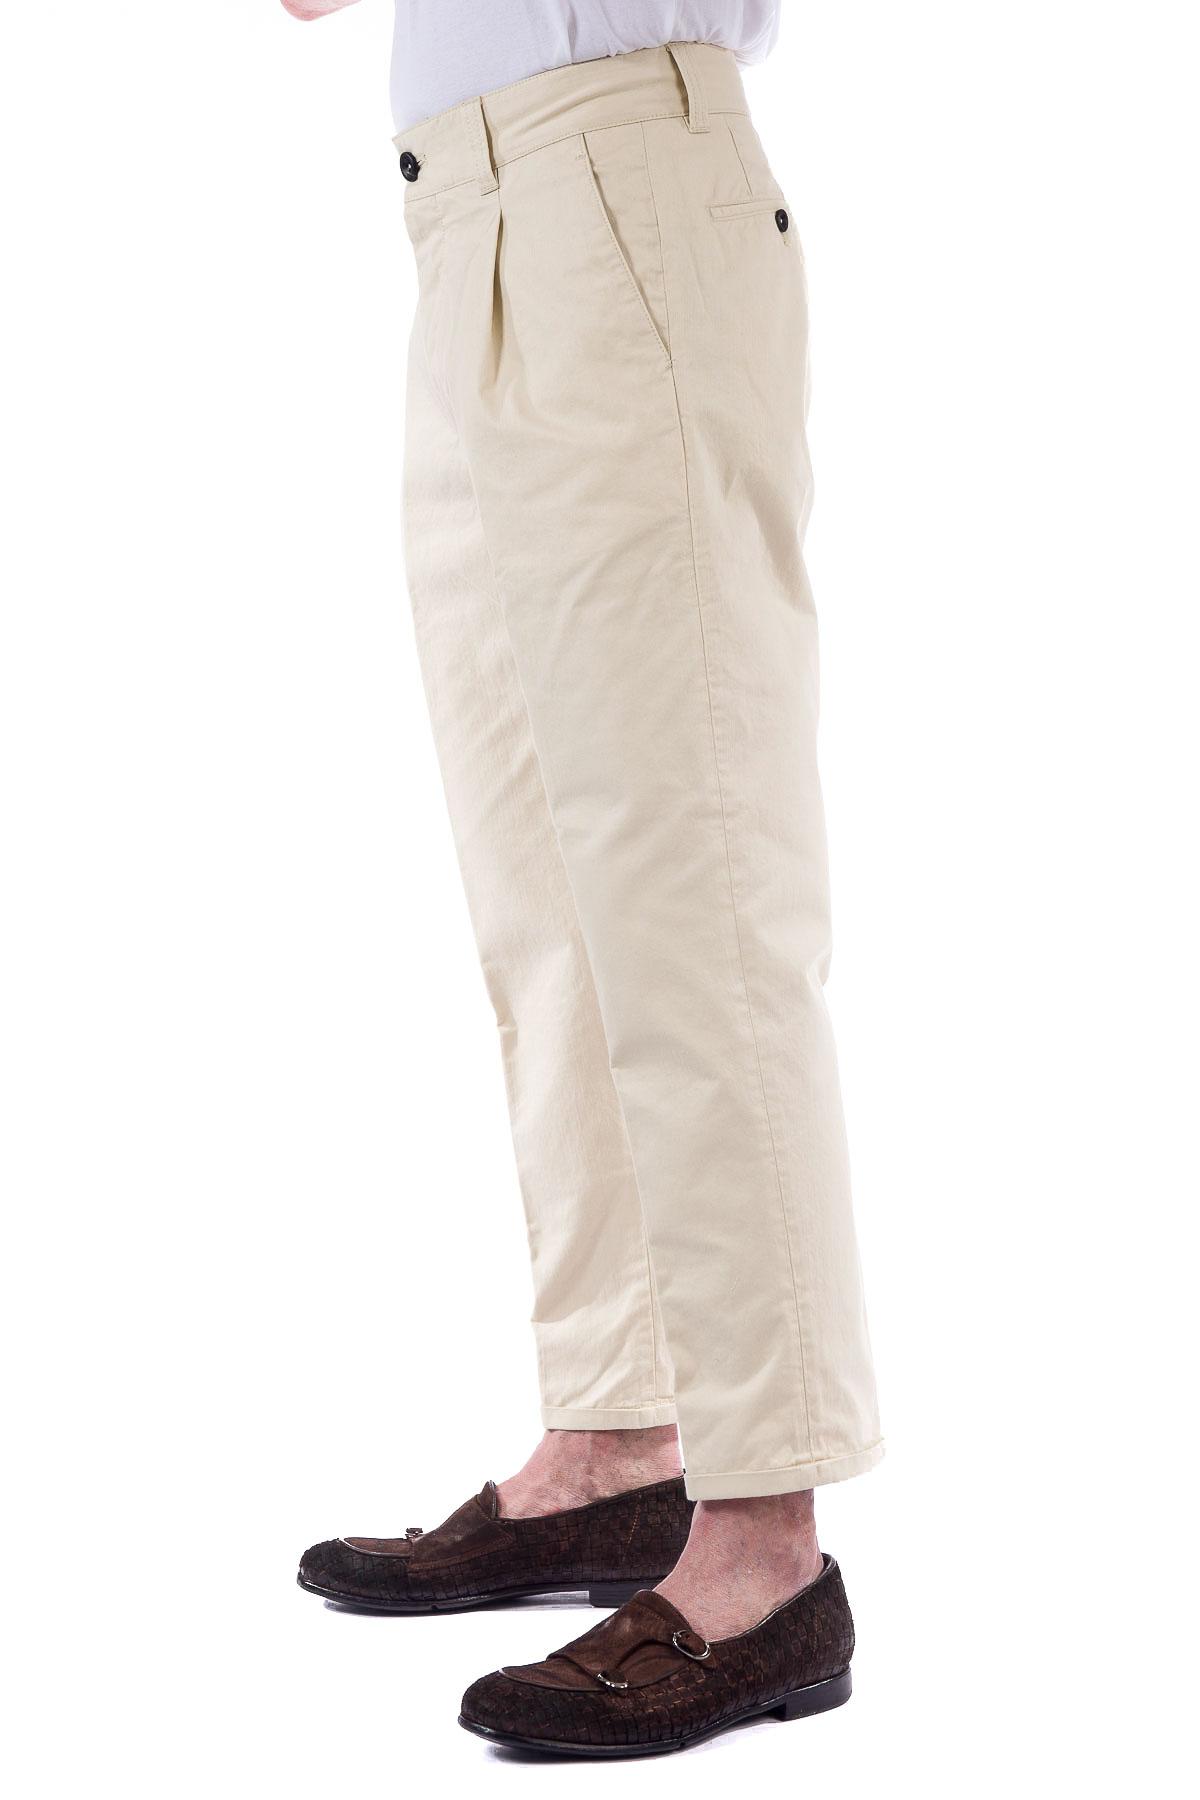 pantalone FORWARD PT   9   1-CW-HL05B00FWD NT900015